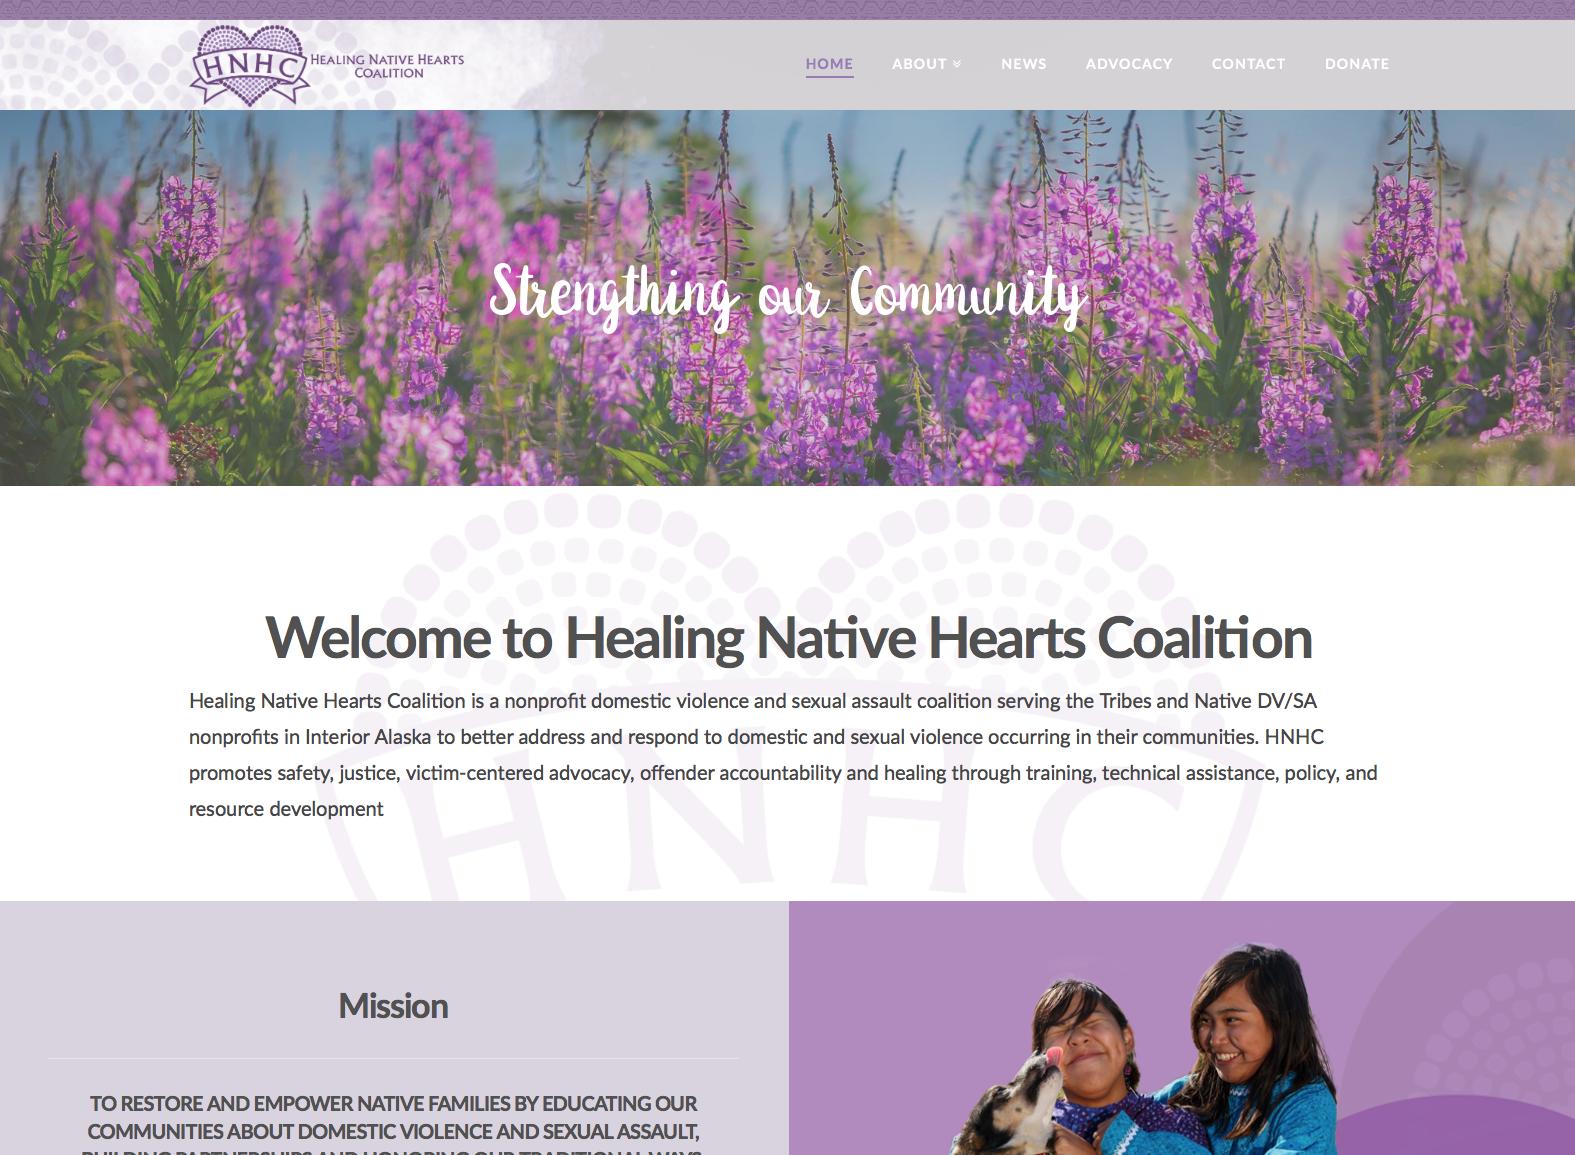 Healing Native Hearts Coalition